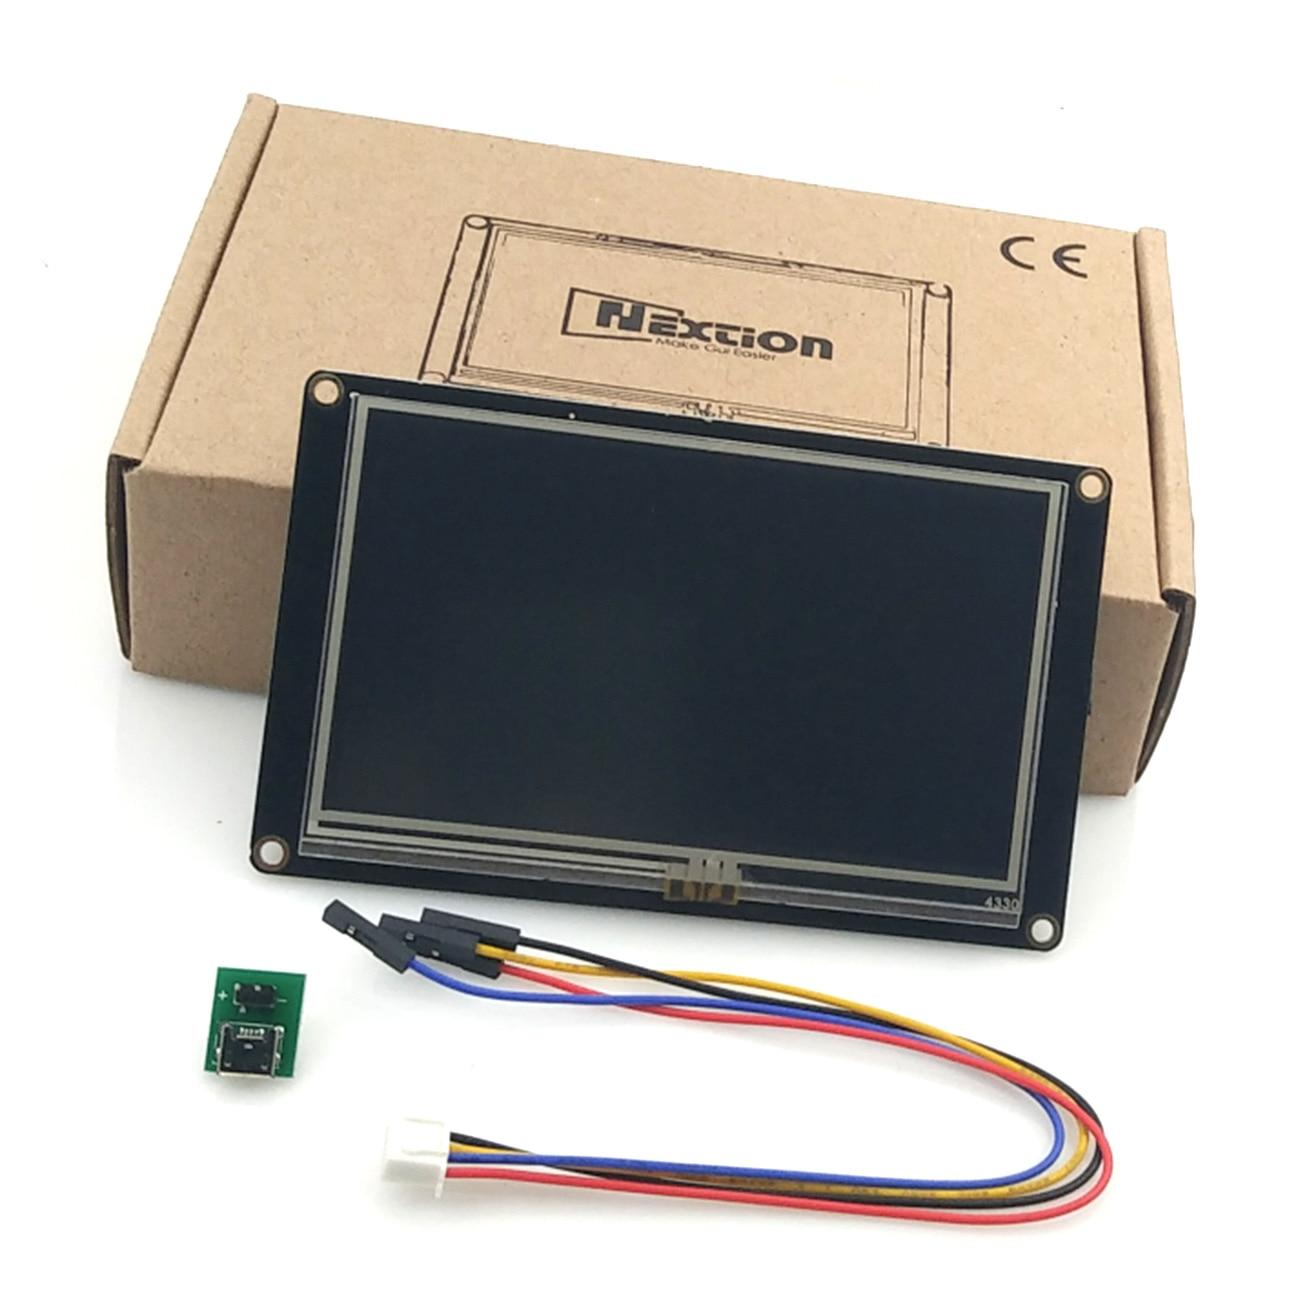 Nextion 4.3 Enhanced HMI Intelligent Smart USART UART Serial Touch TFT LCD Module Display Panel For Raspberry Pi Kits